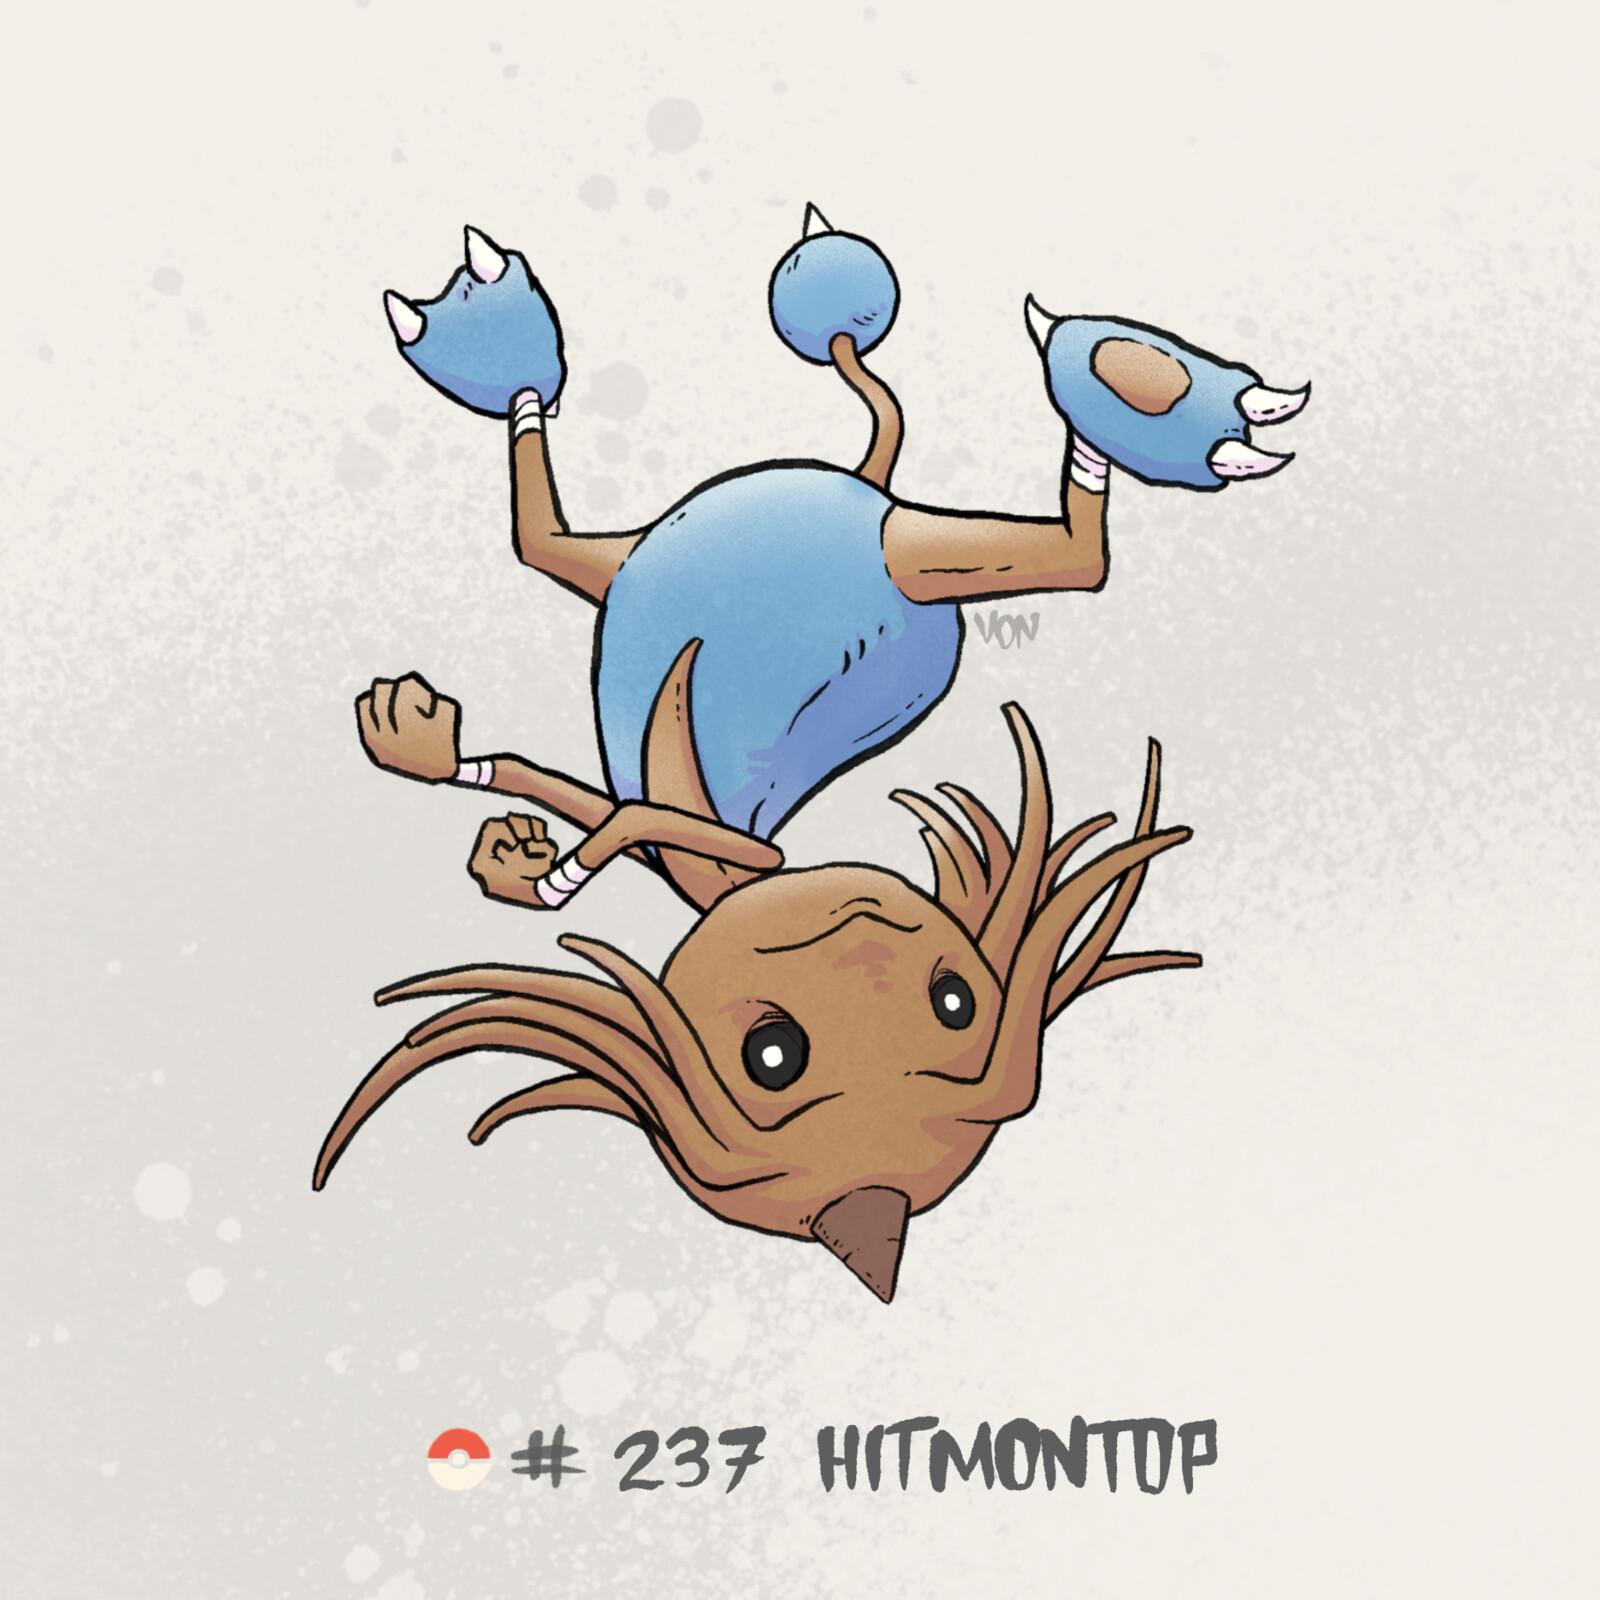 #237 Hitmontop